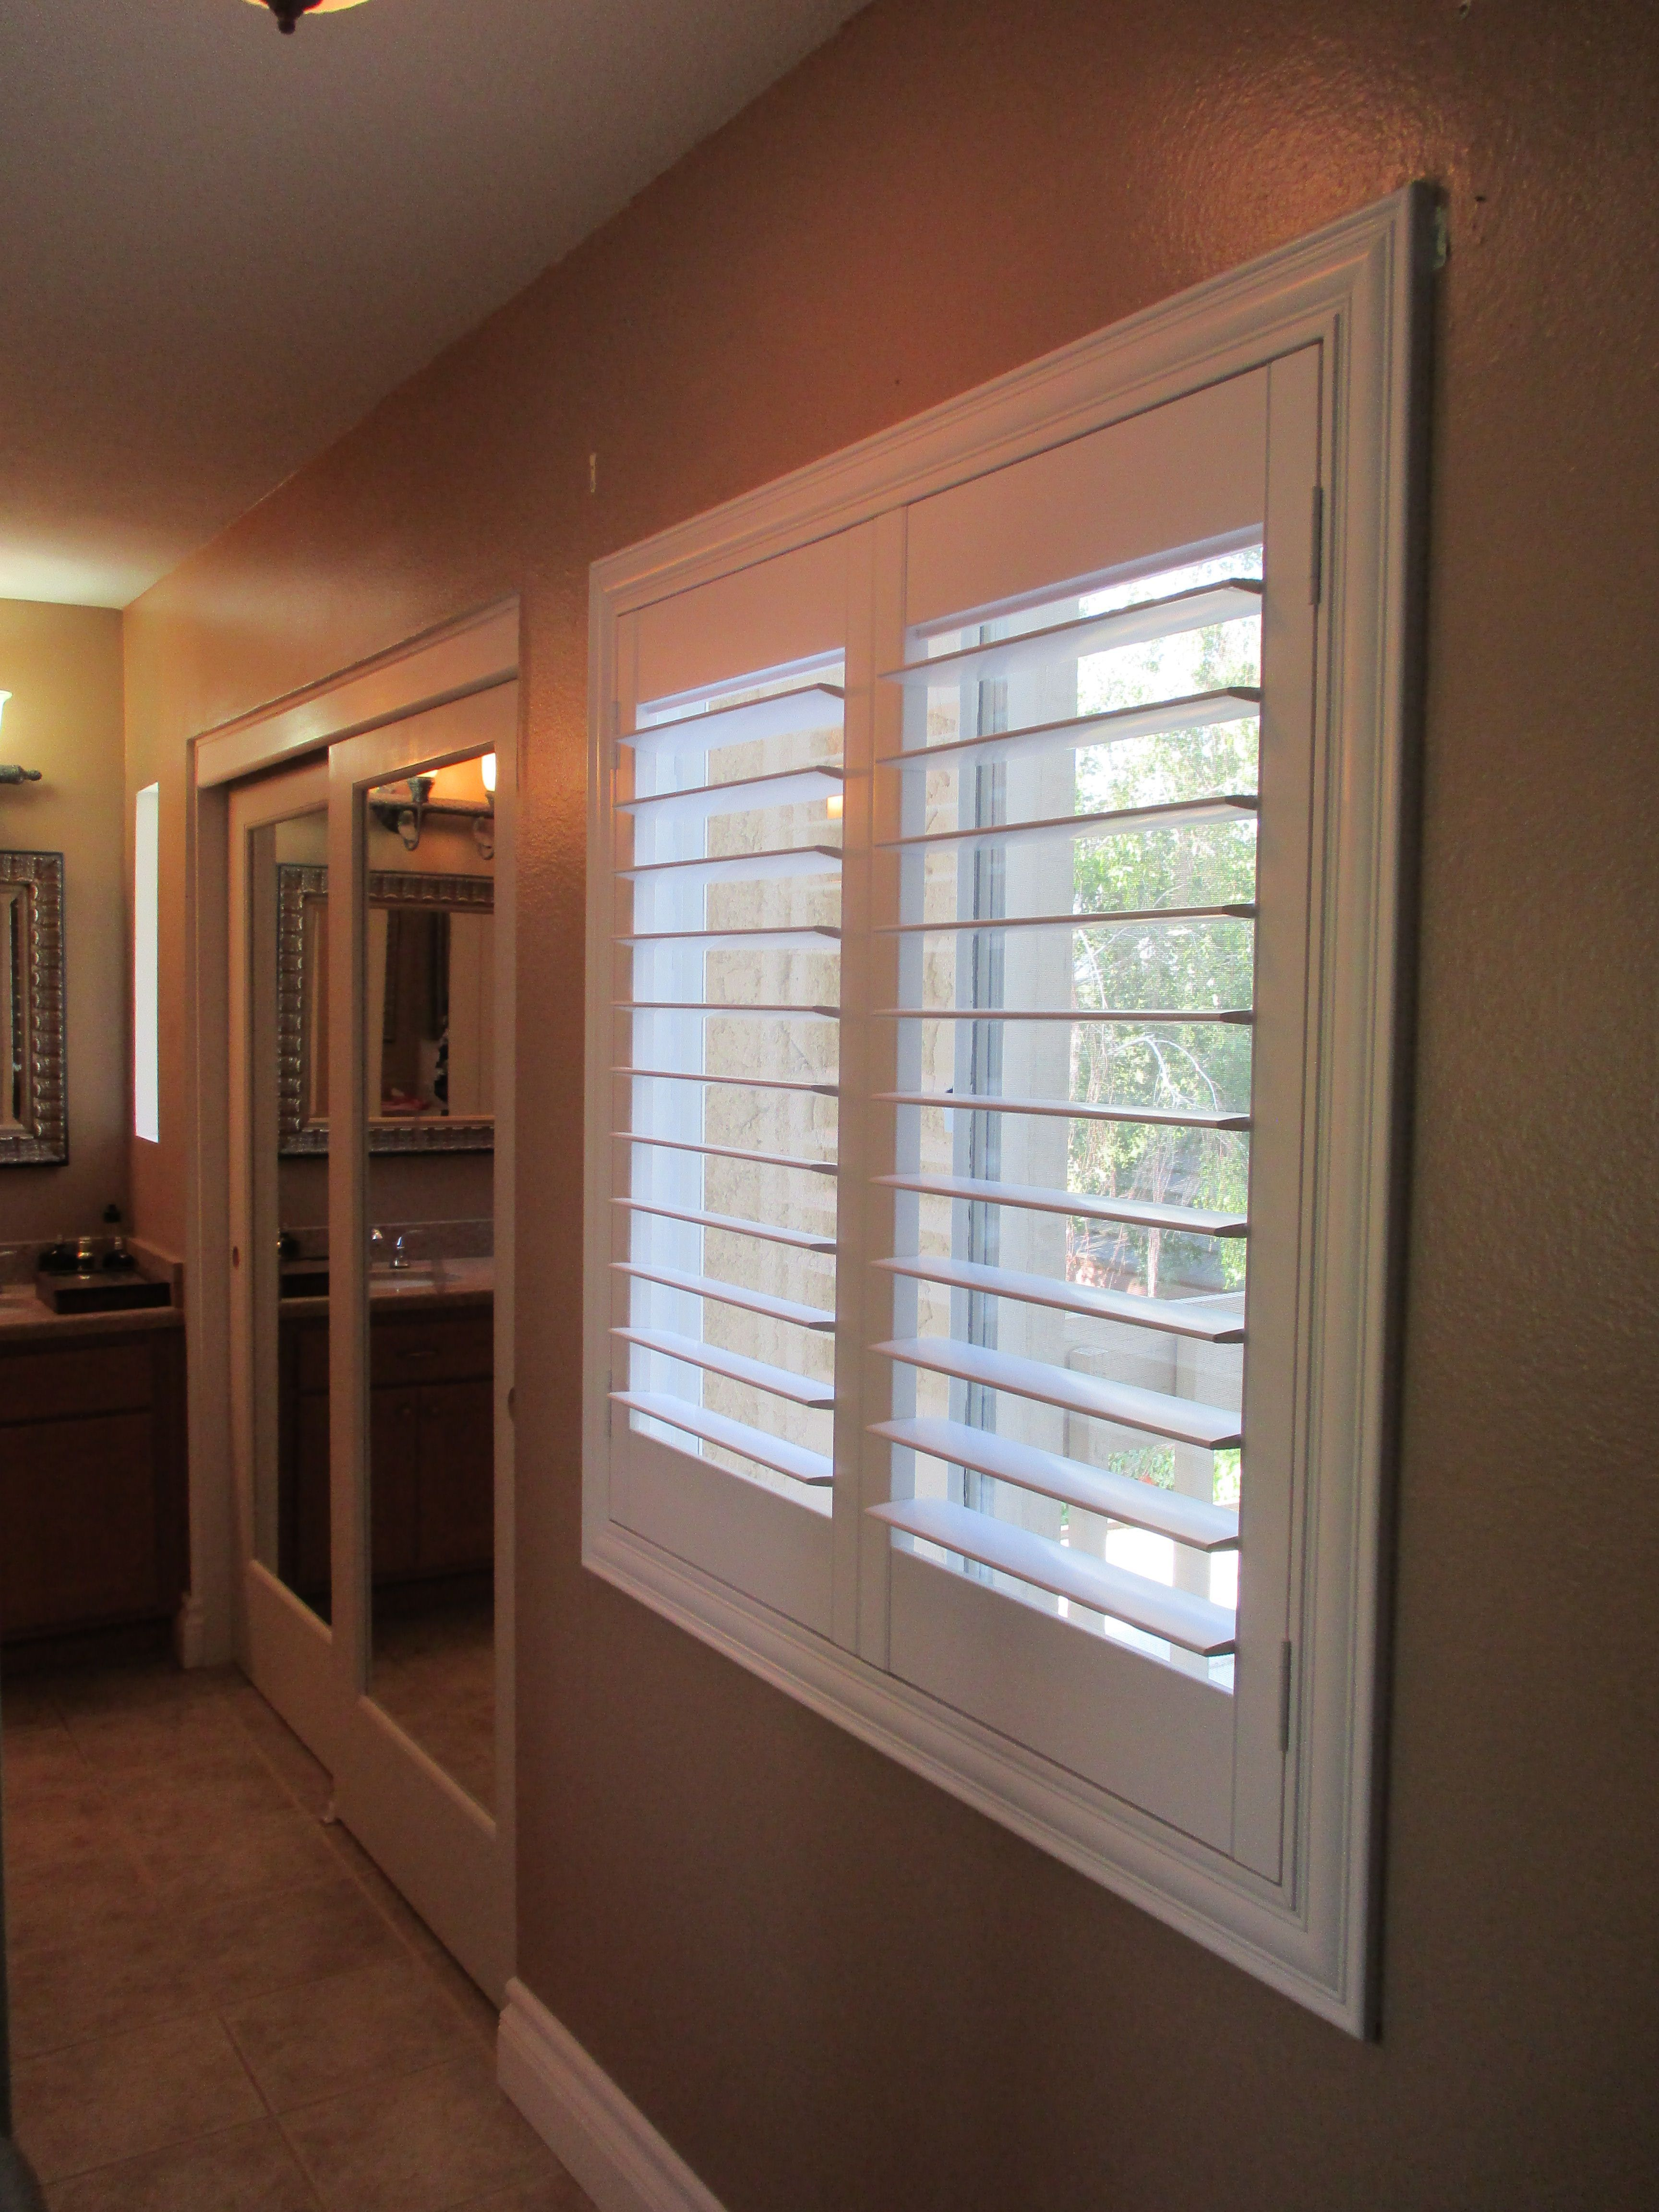 Sliding window over kitchen sink  inside sliding doors master bath create eyecatching brighter